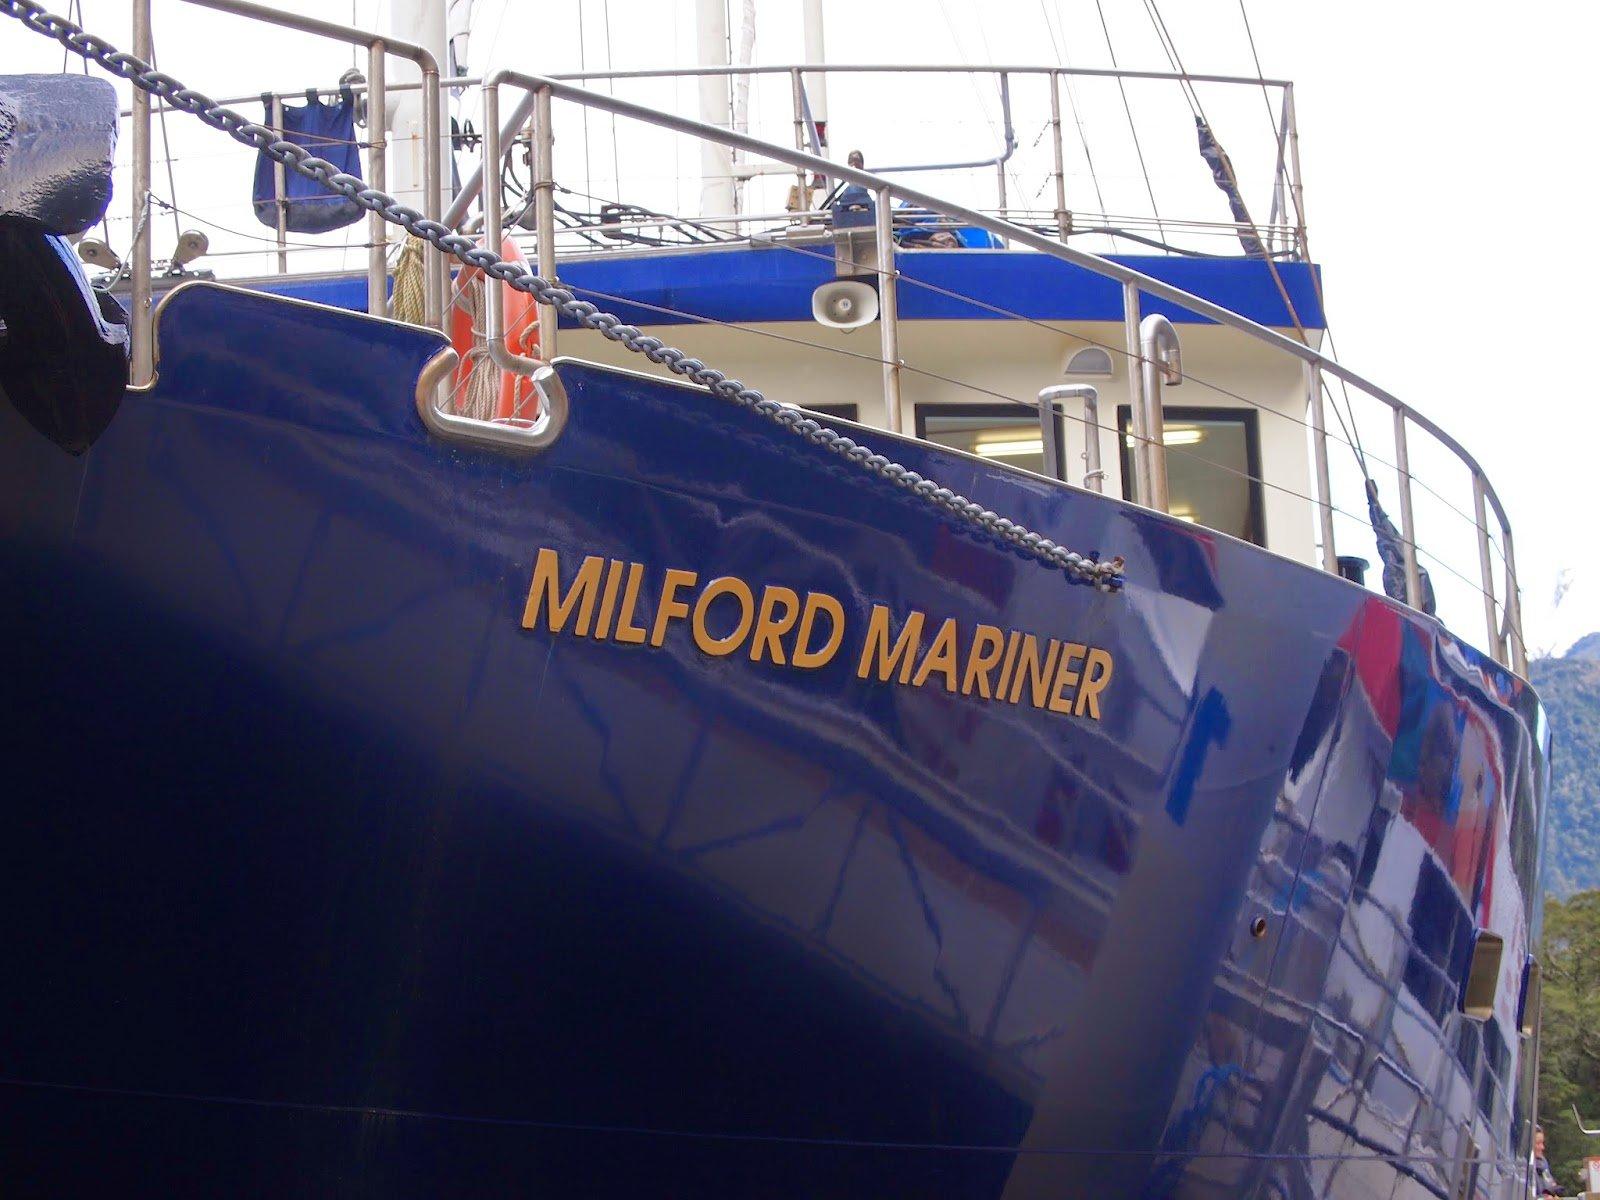 Milford Mariner Real Journeys